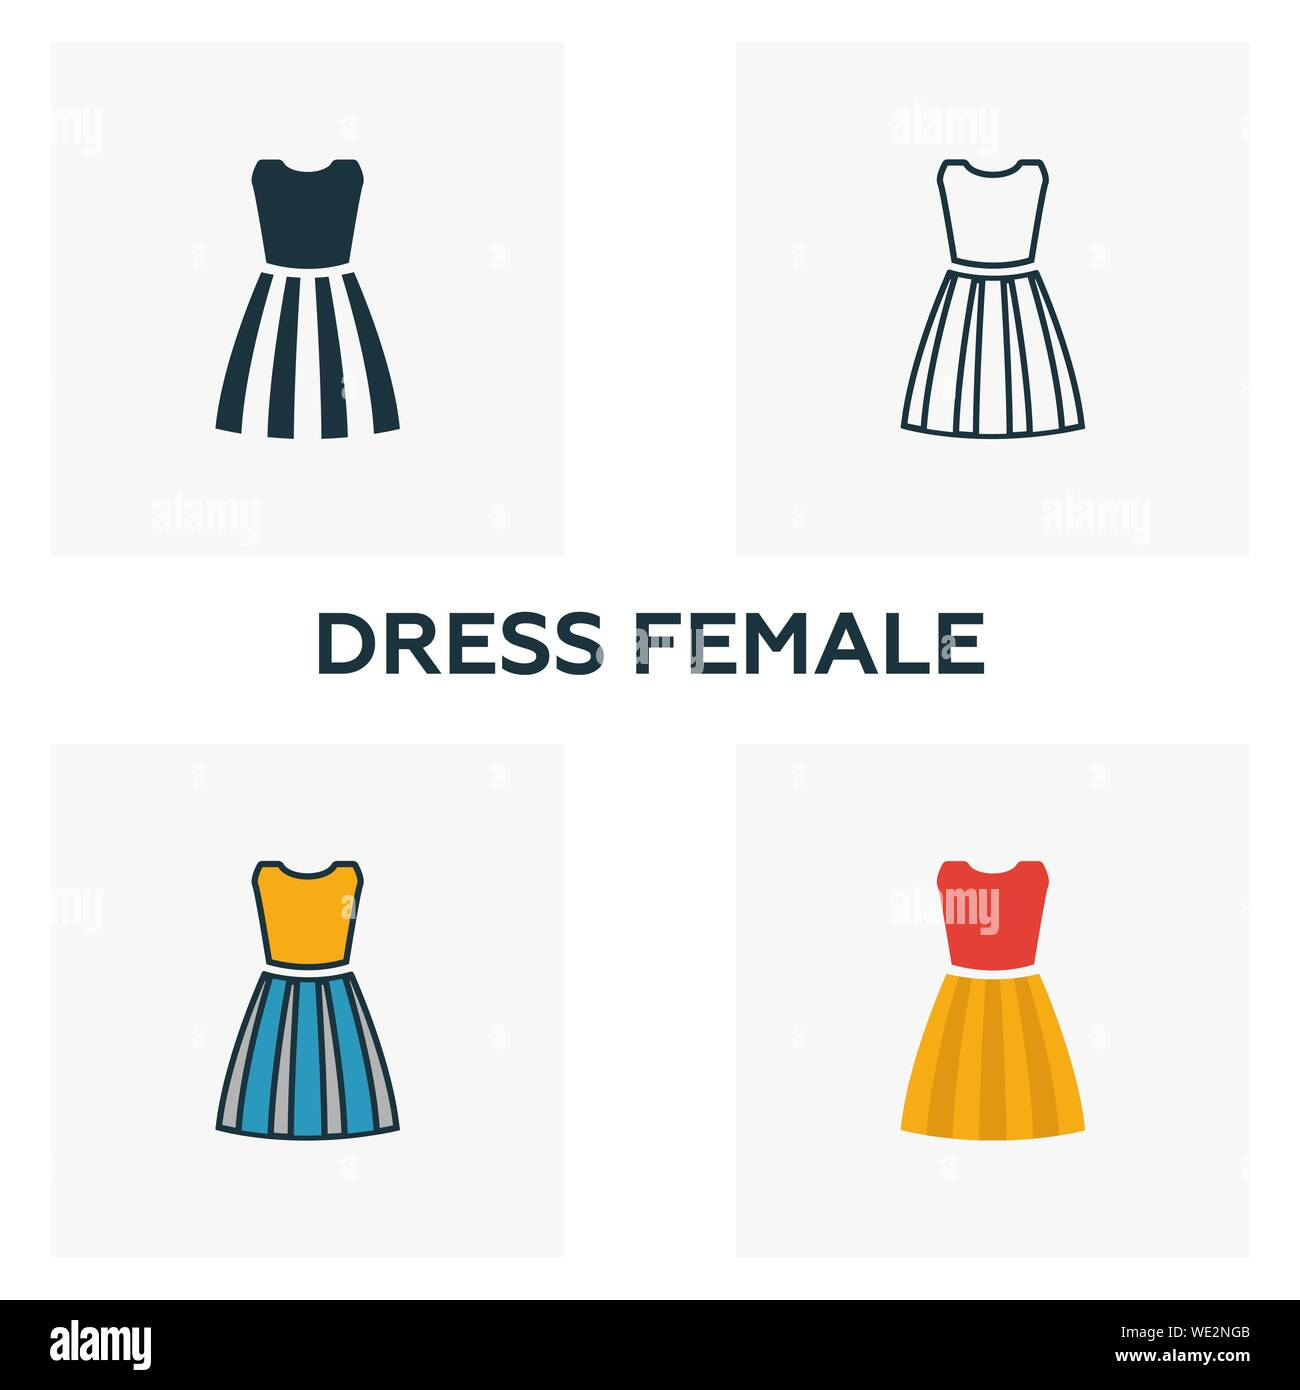 Fashion Drawing Woman Evening Dress Stock Photos & Fashion